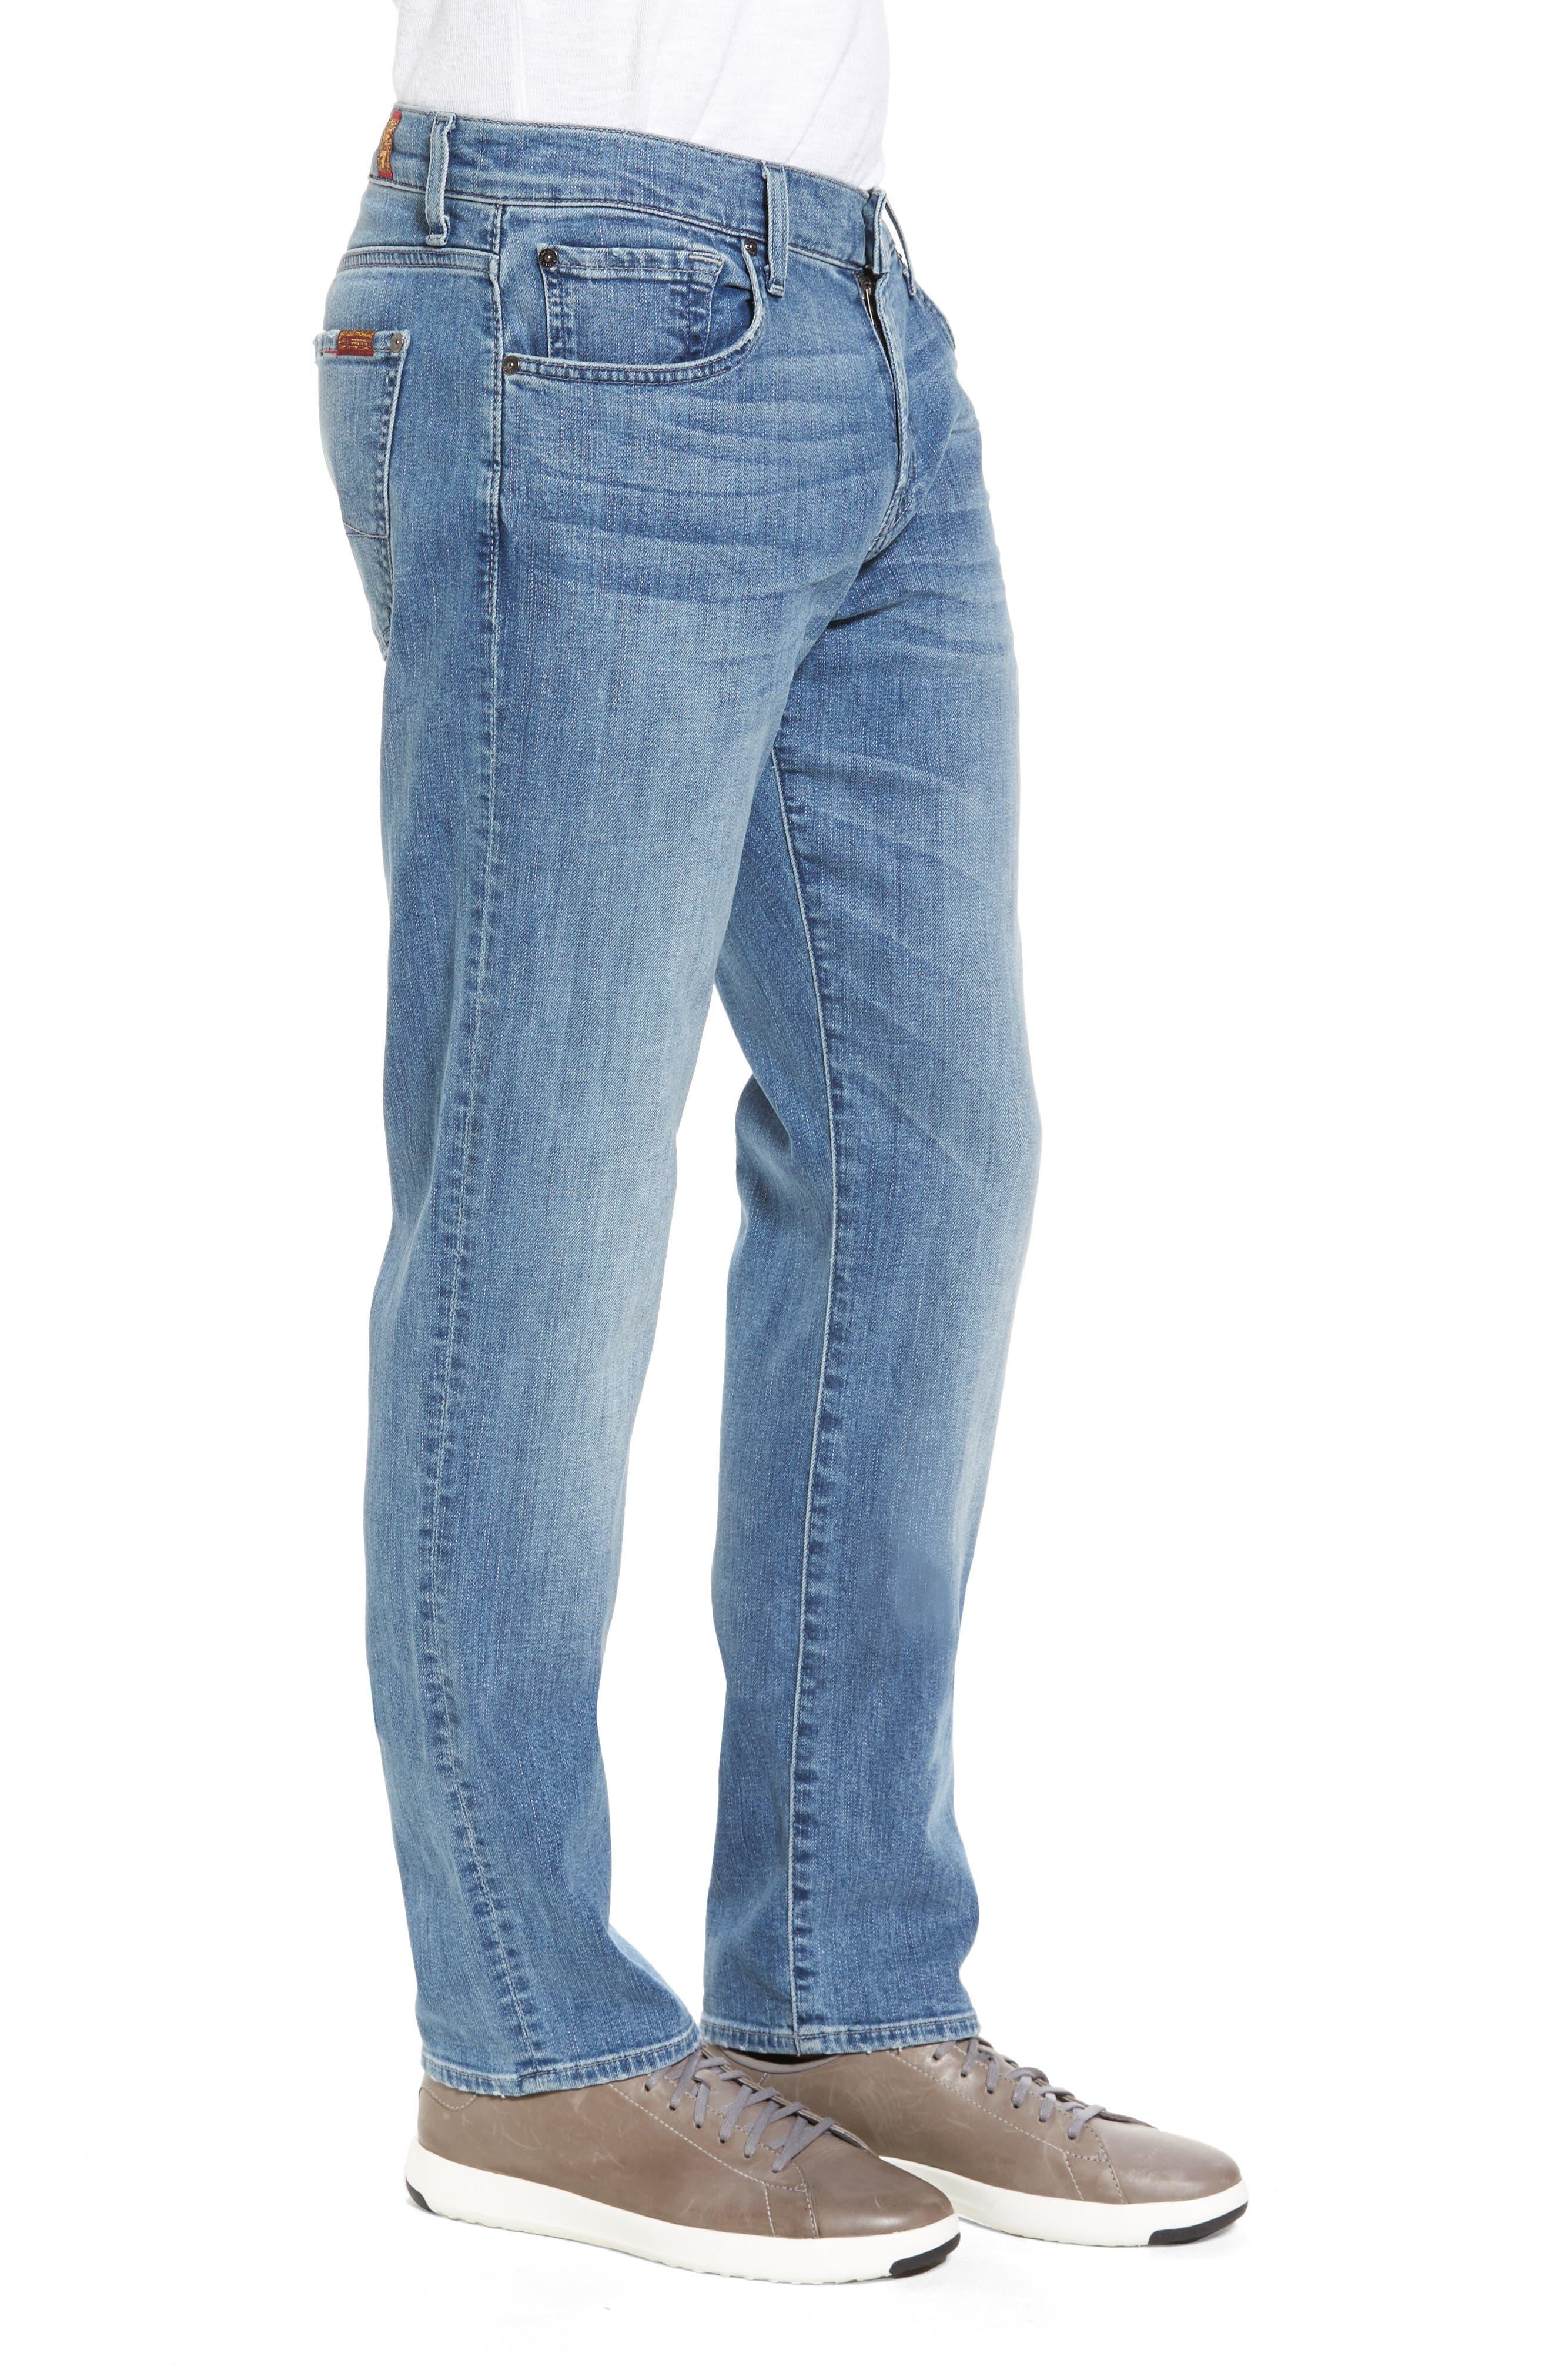 7 For All Mankind Slim Straight Leg Jeans,                             Alternate thumbnail 3, color,                             400